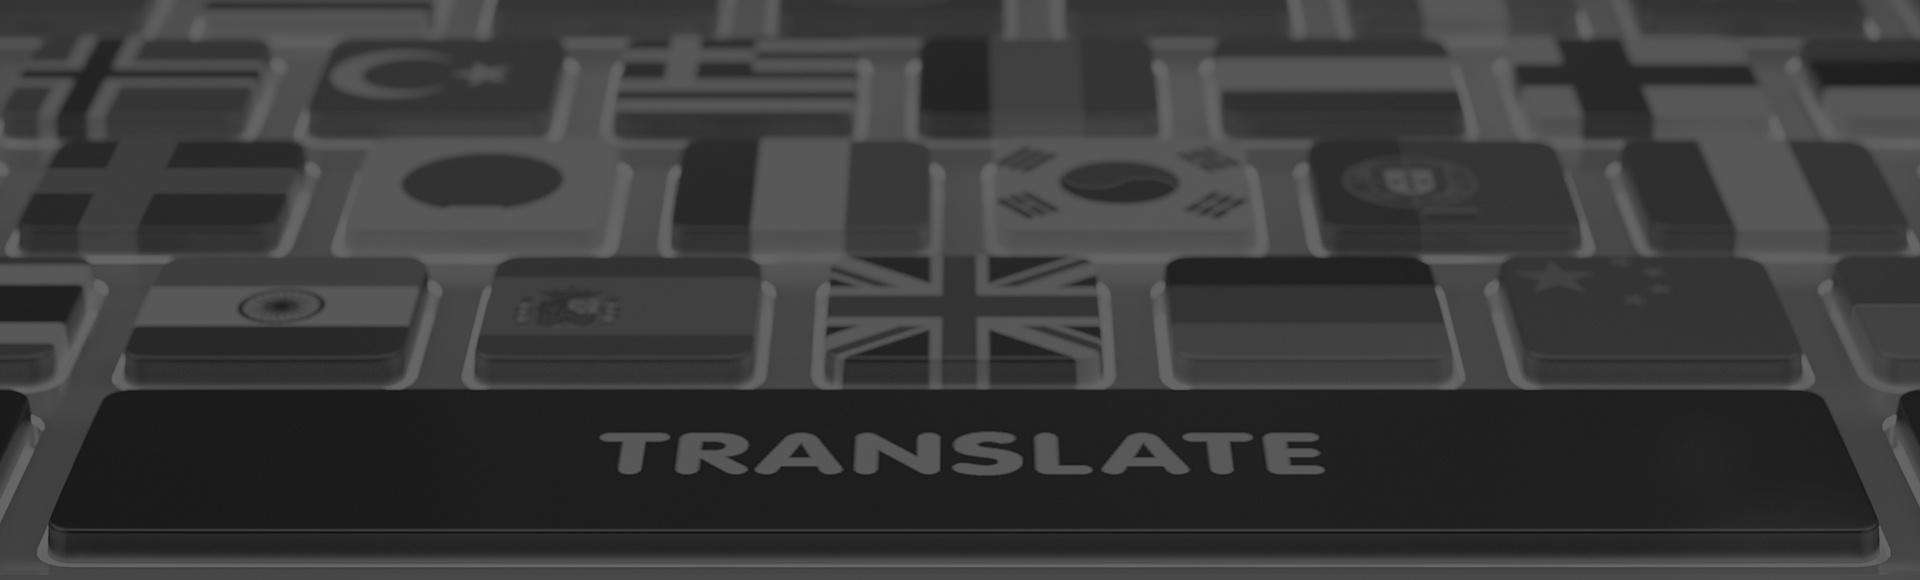 Website Translation Services with Nexa, Dubai